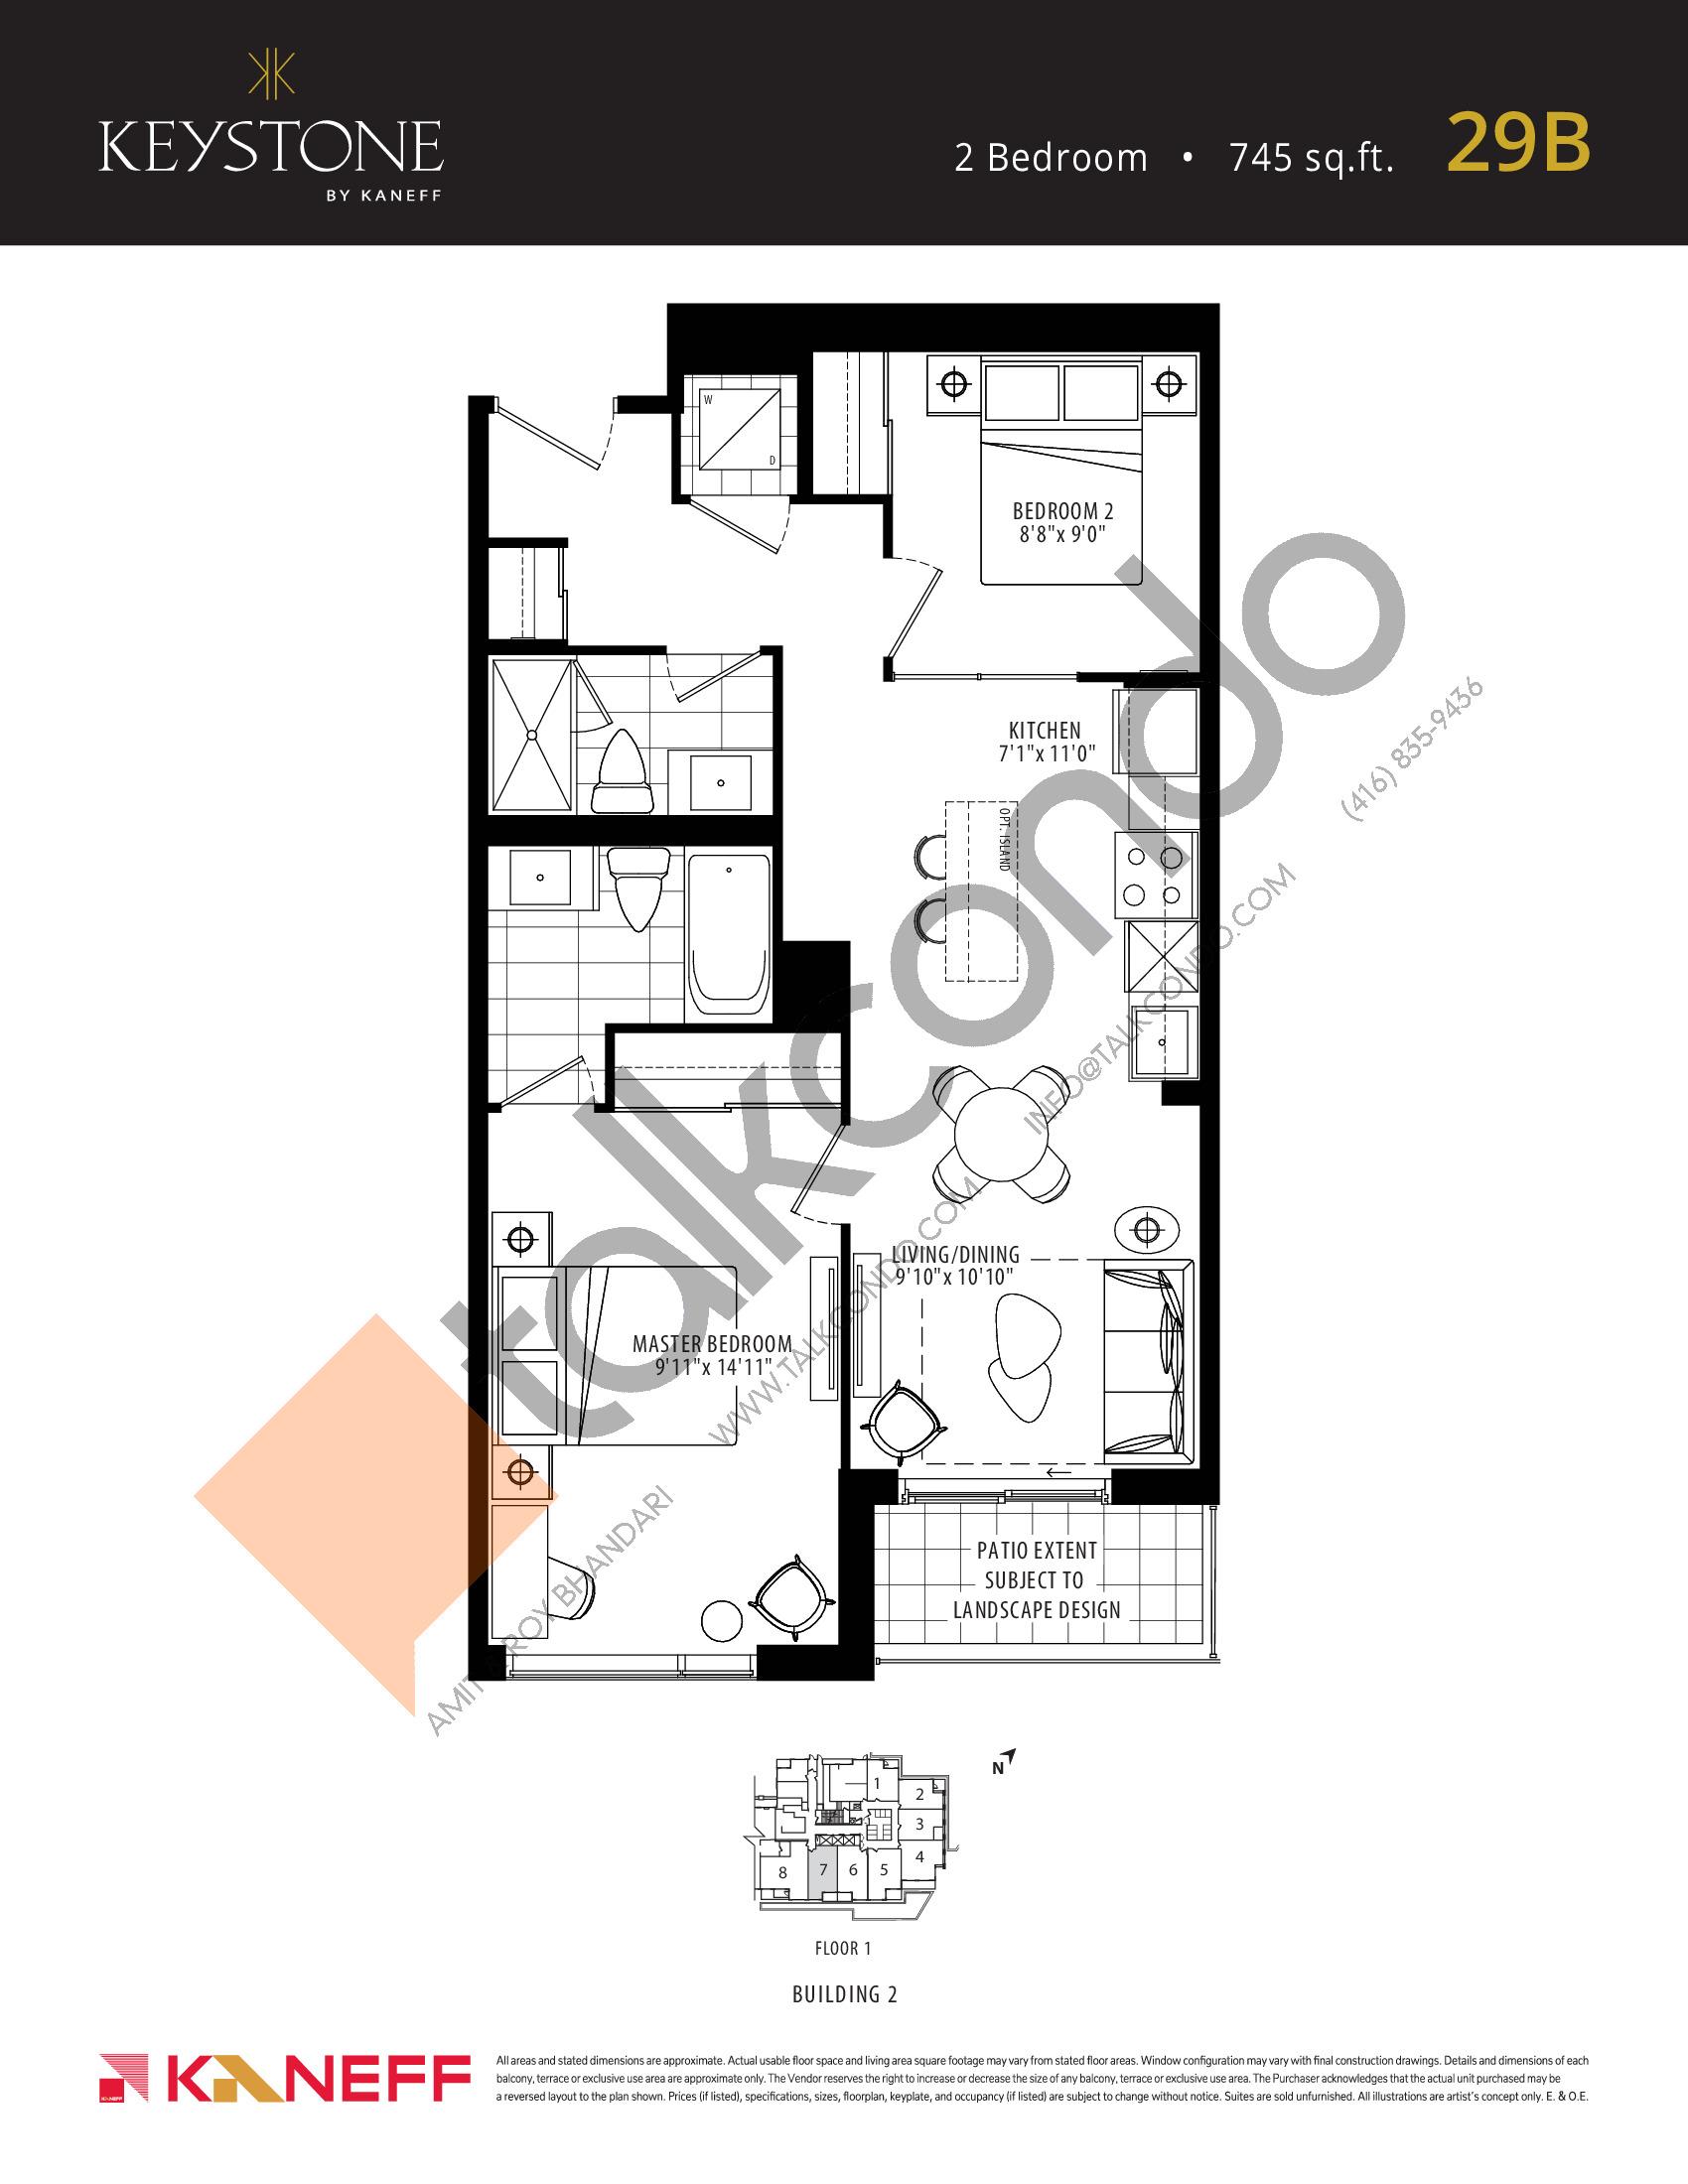 29B Floor Plan at Keystone Condos Phase 2 - 745 sq.ft